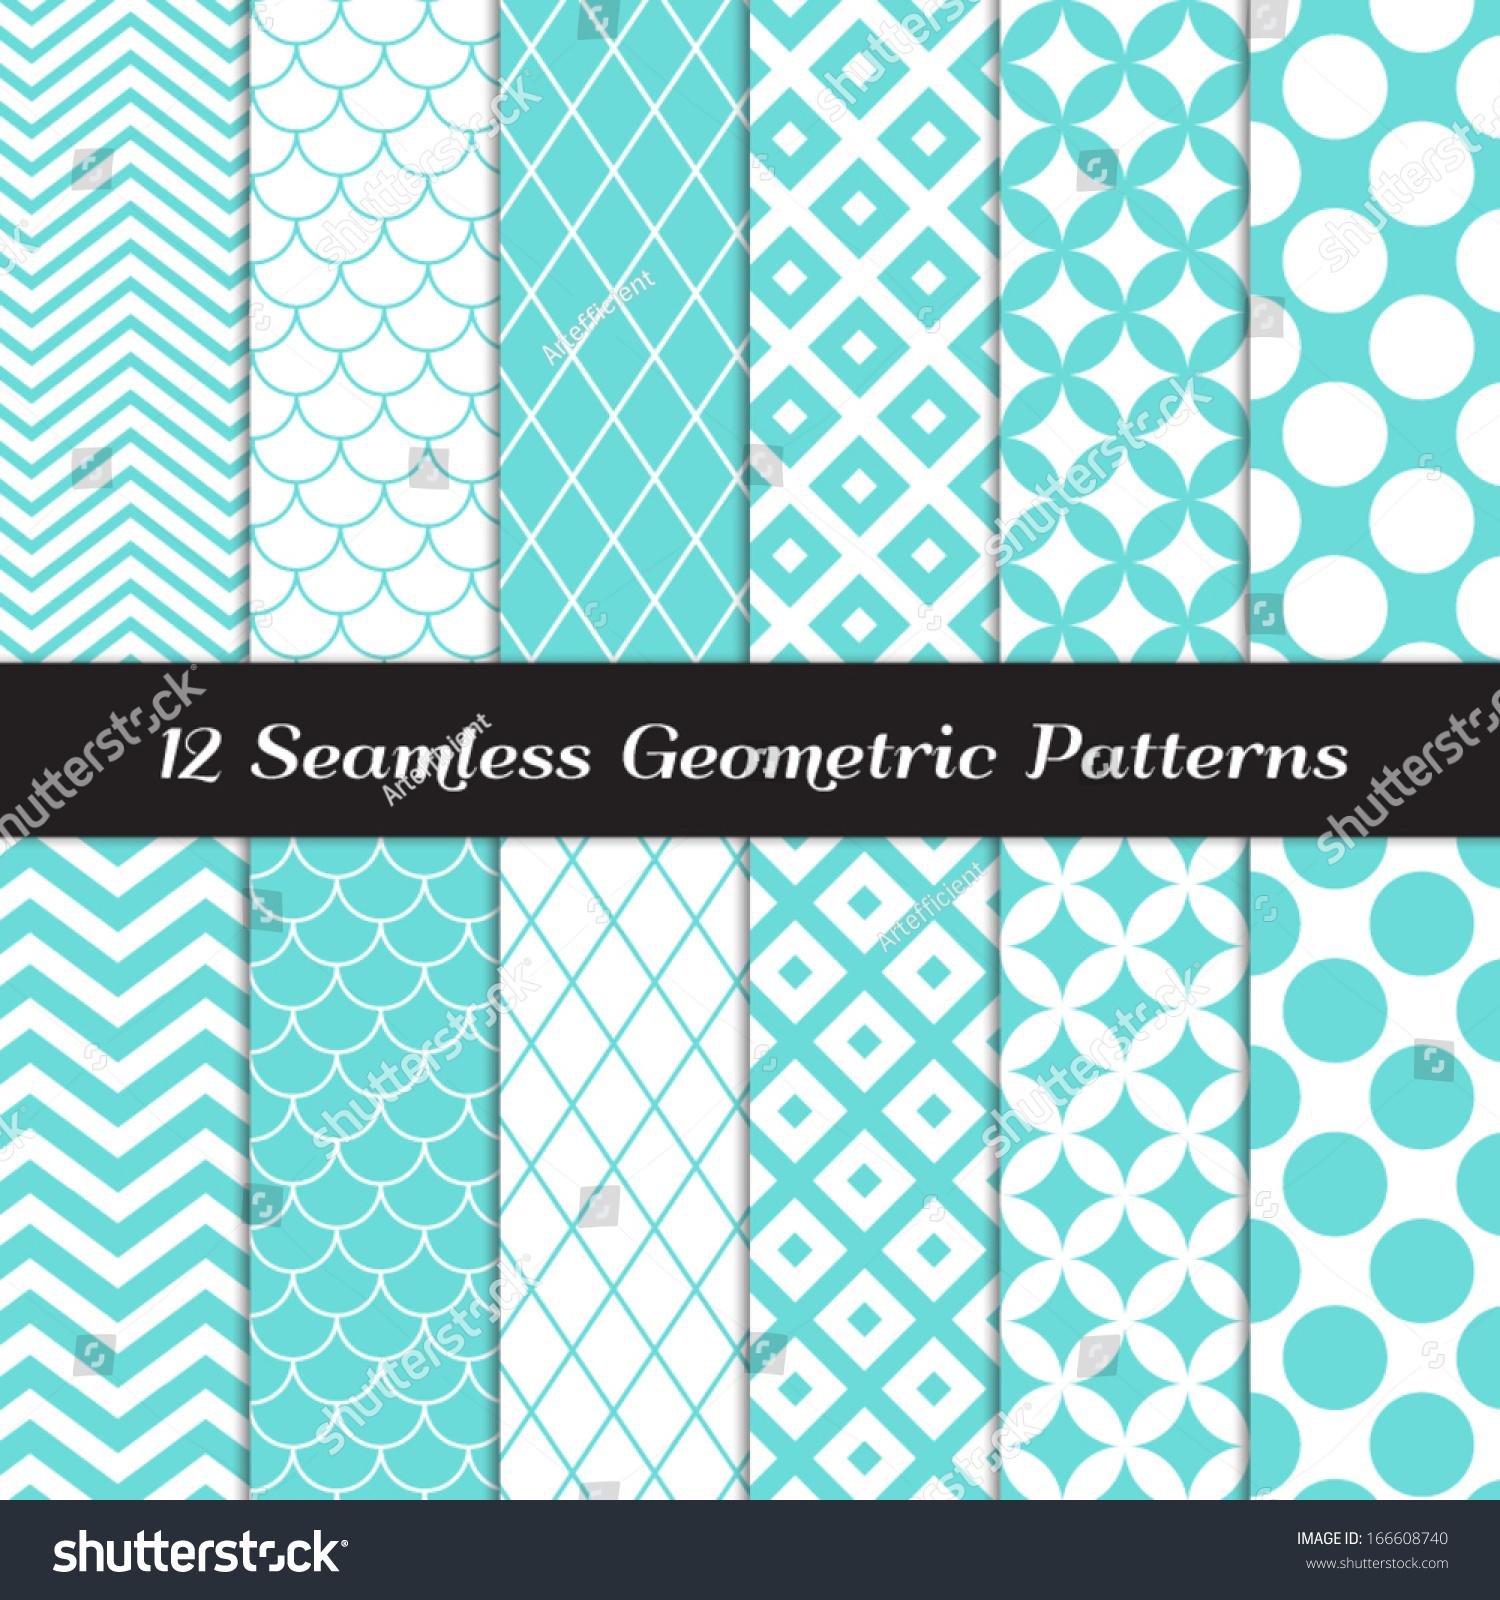 Turquoise And White Geometric Seamless Patterns Retro Mod Backgrounds In Jumbo Polka Dot Diamond